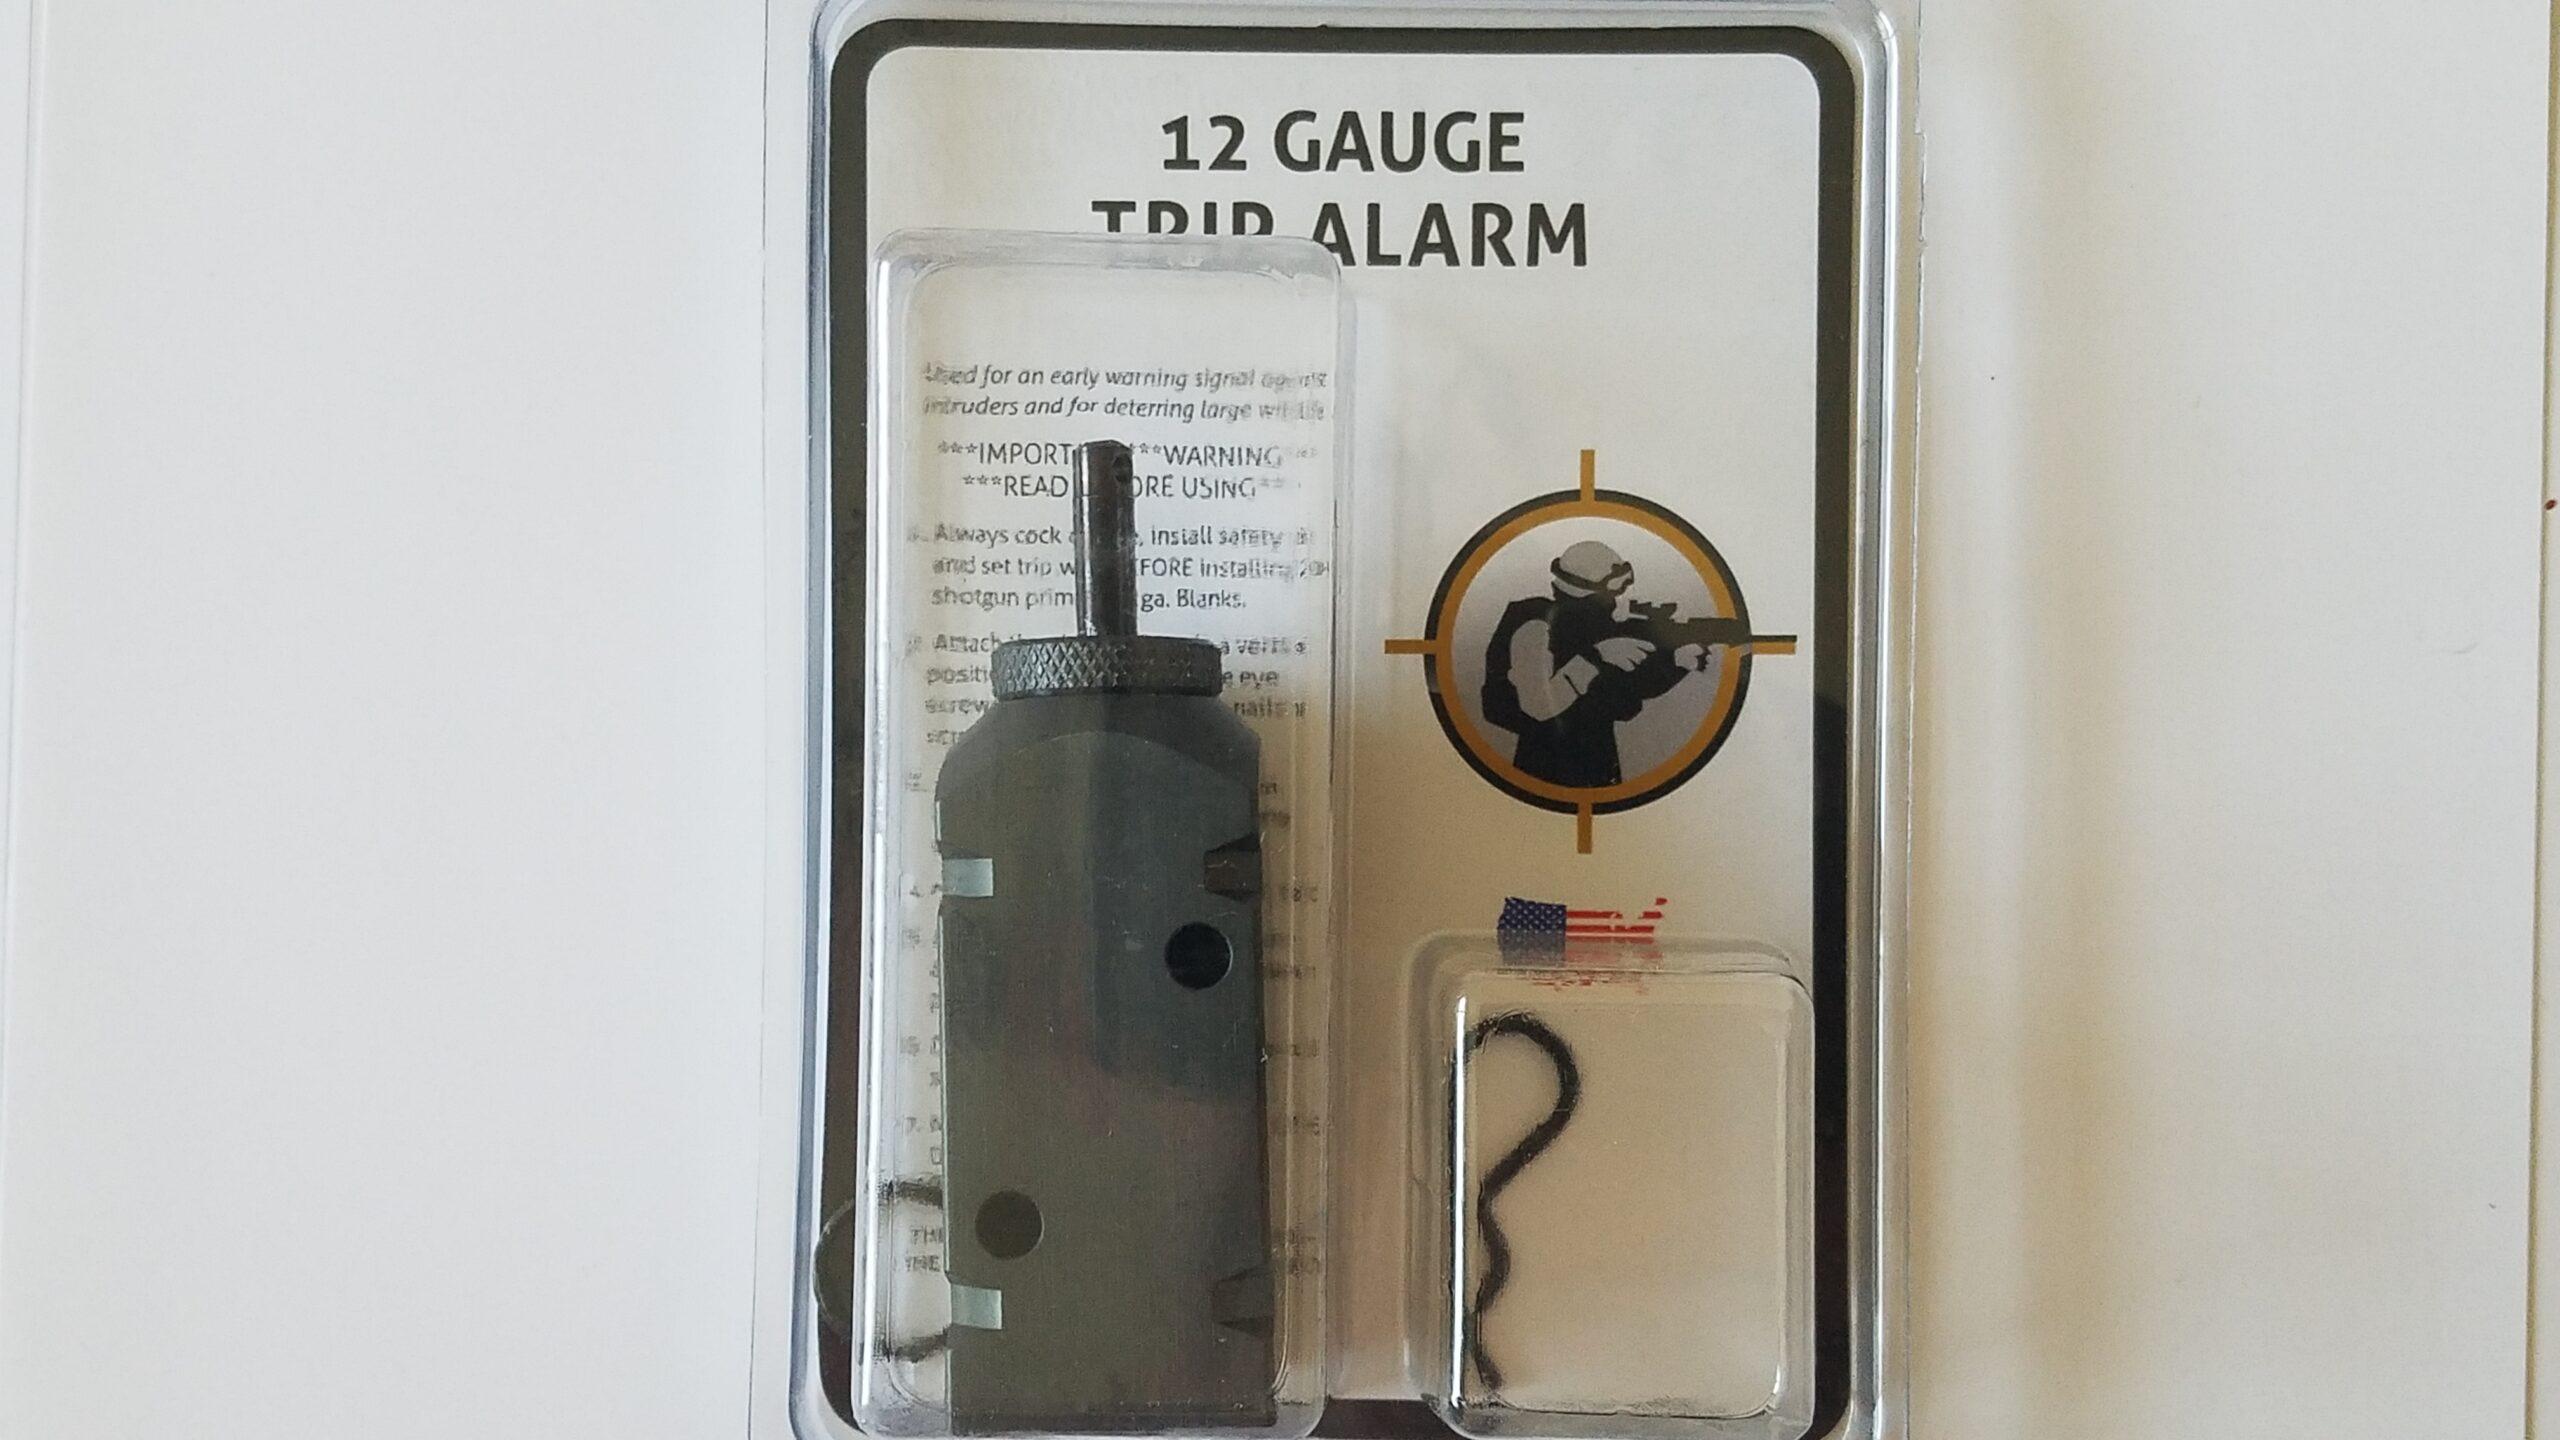 12 Gauge Perimeter Trip Alarm